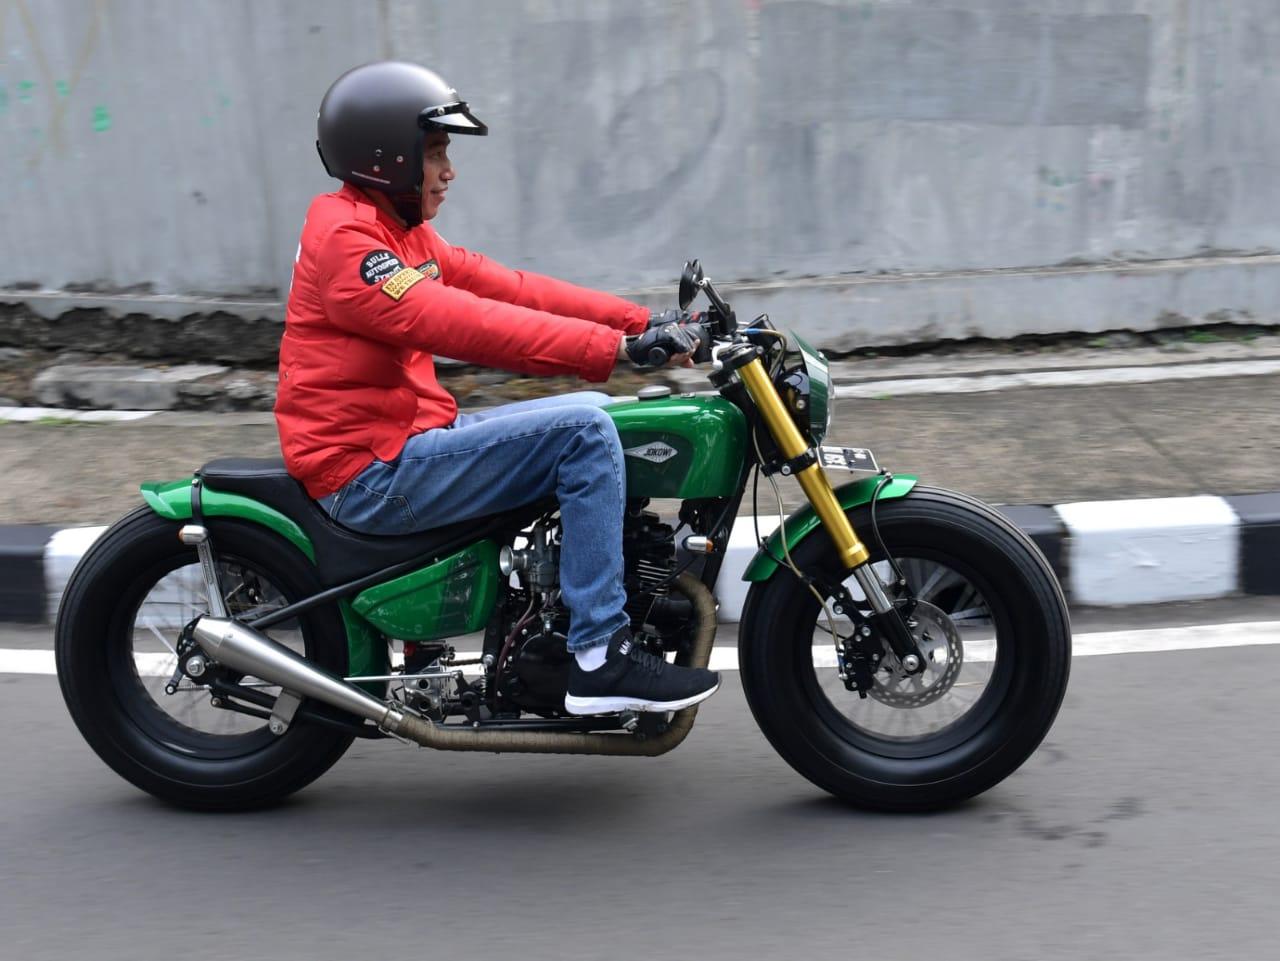 Naik Motor, Presiden Jokowi Blusukan ke Pasar Anyar di Tangerang